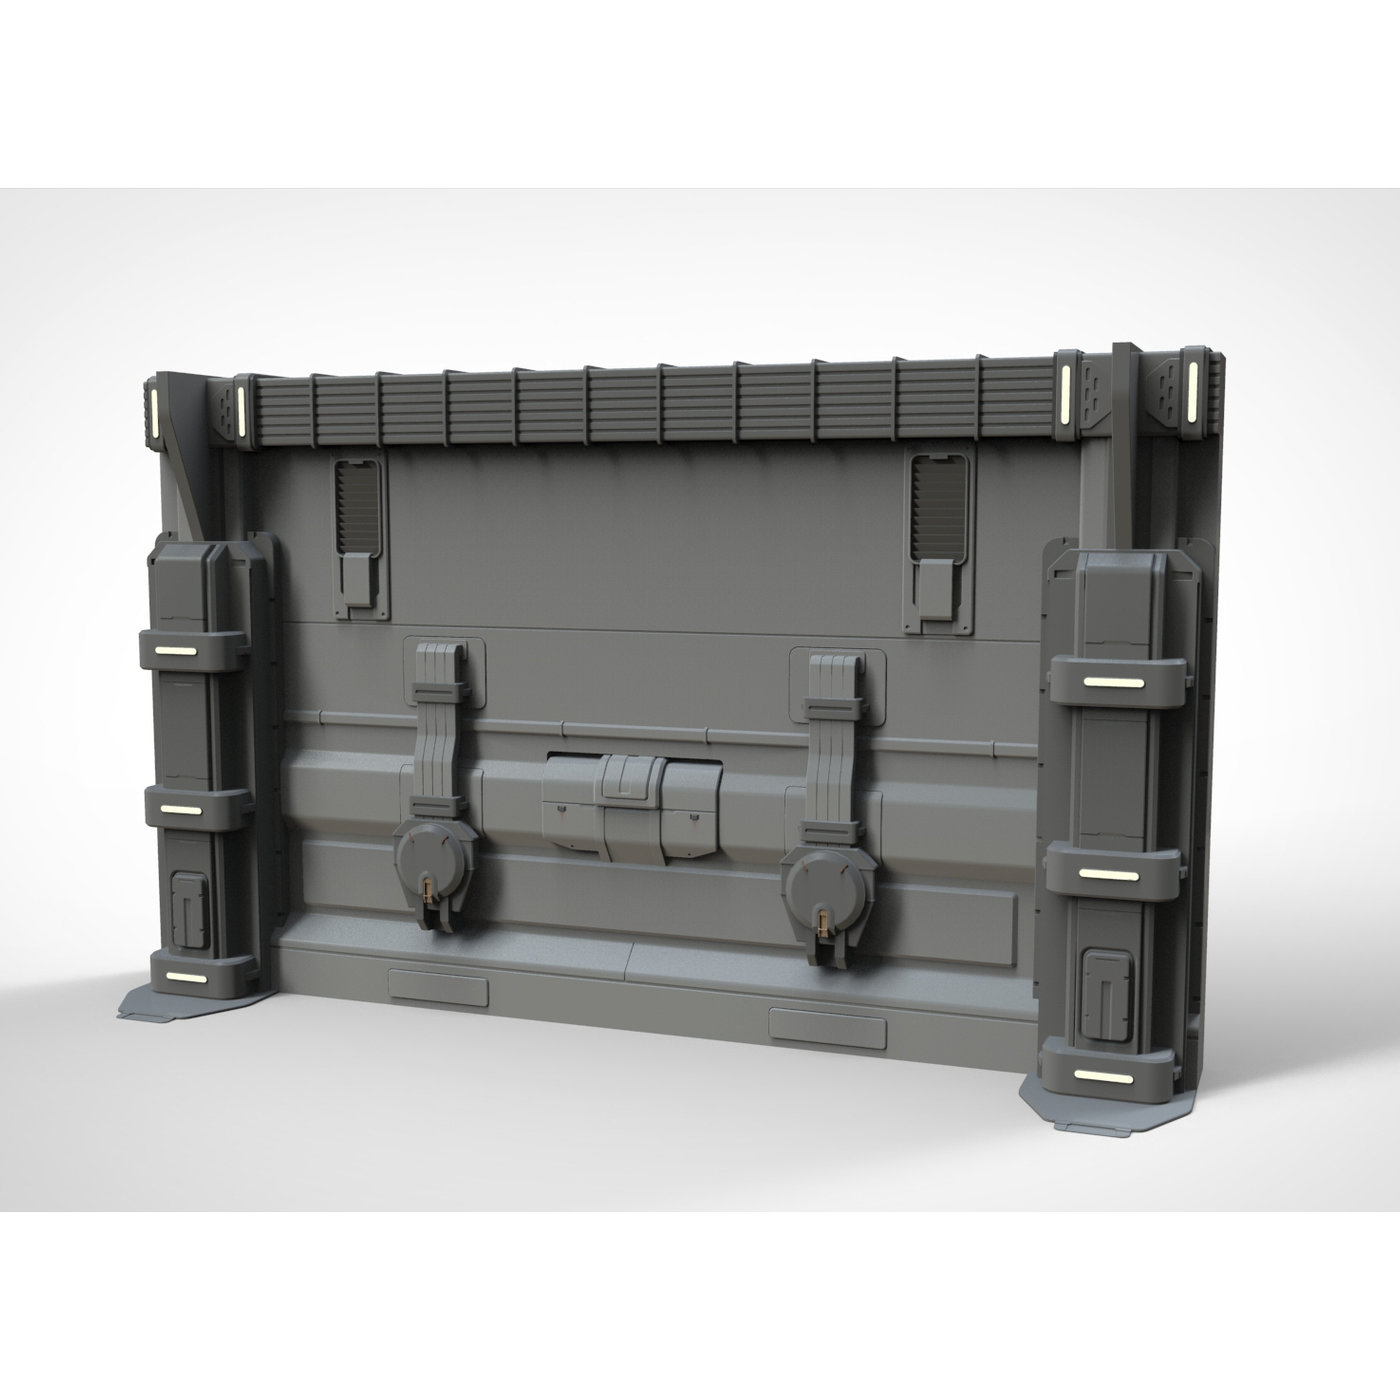 sci-fi Architecture kitbash 30